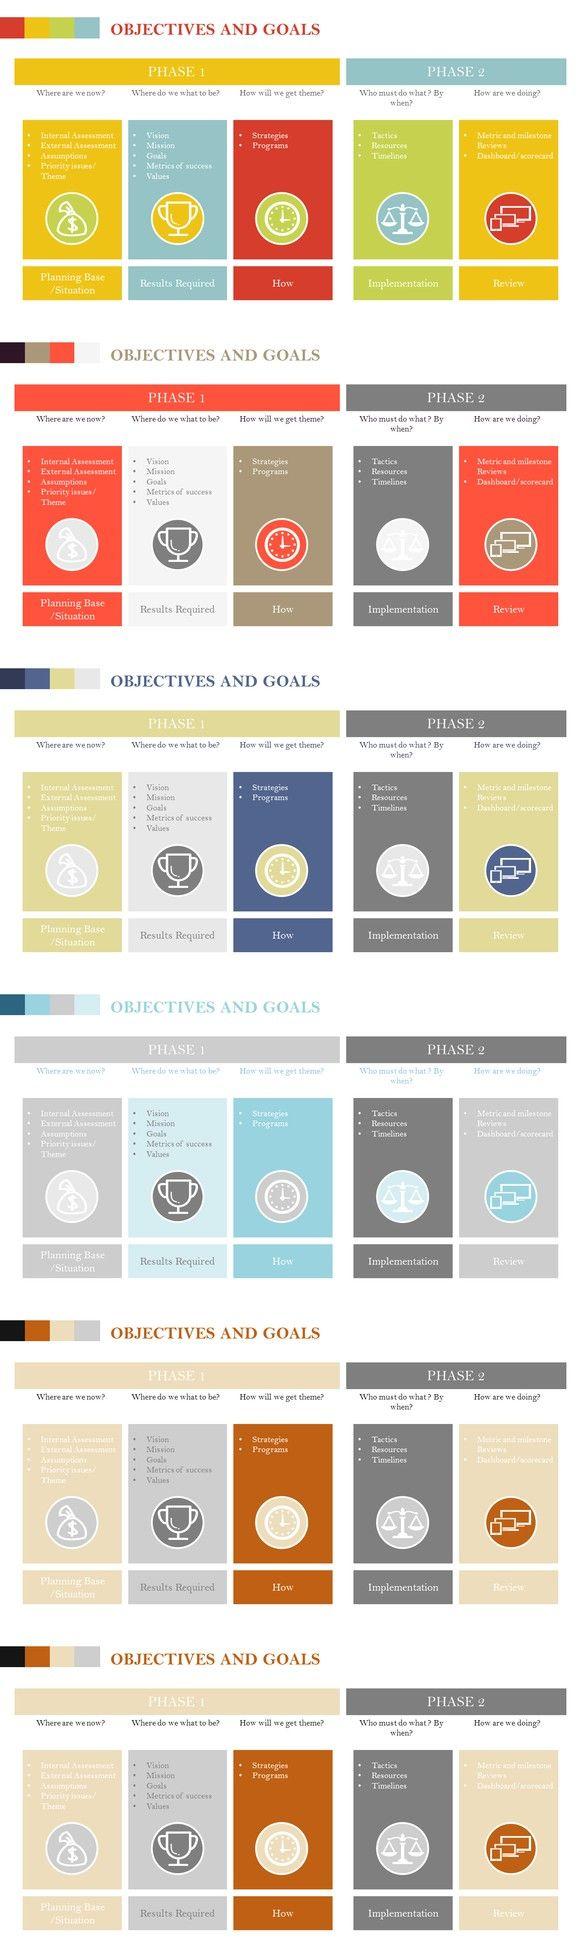 Powerpoint poster presentation templates images templates template powerpoint poster image collections templates example eth zurich powerpoint template choice image powerpoint template powerpoint toneelgroepblik Image collections